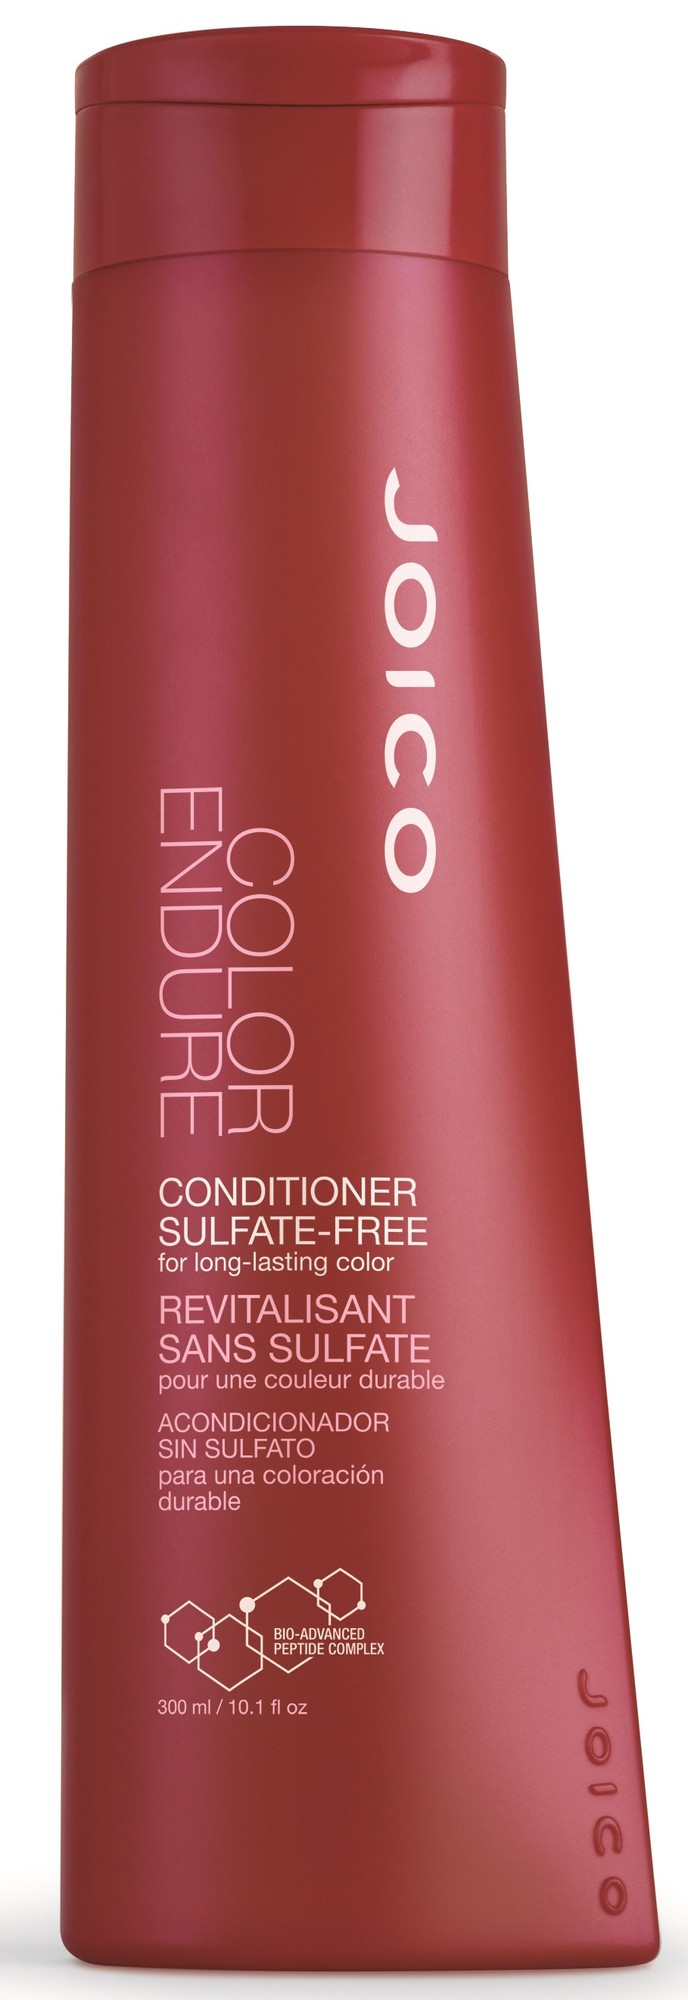 Color Endure Conditioner 300 ml